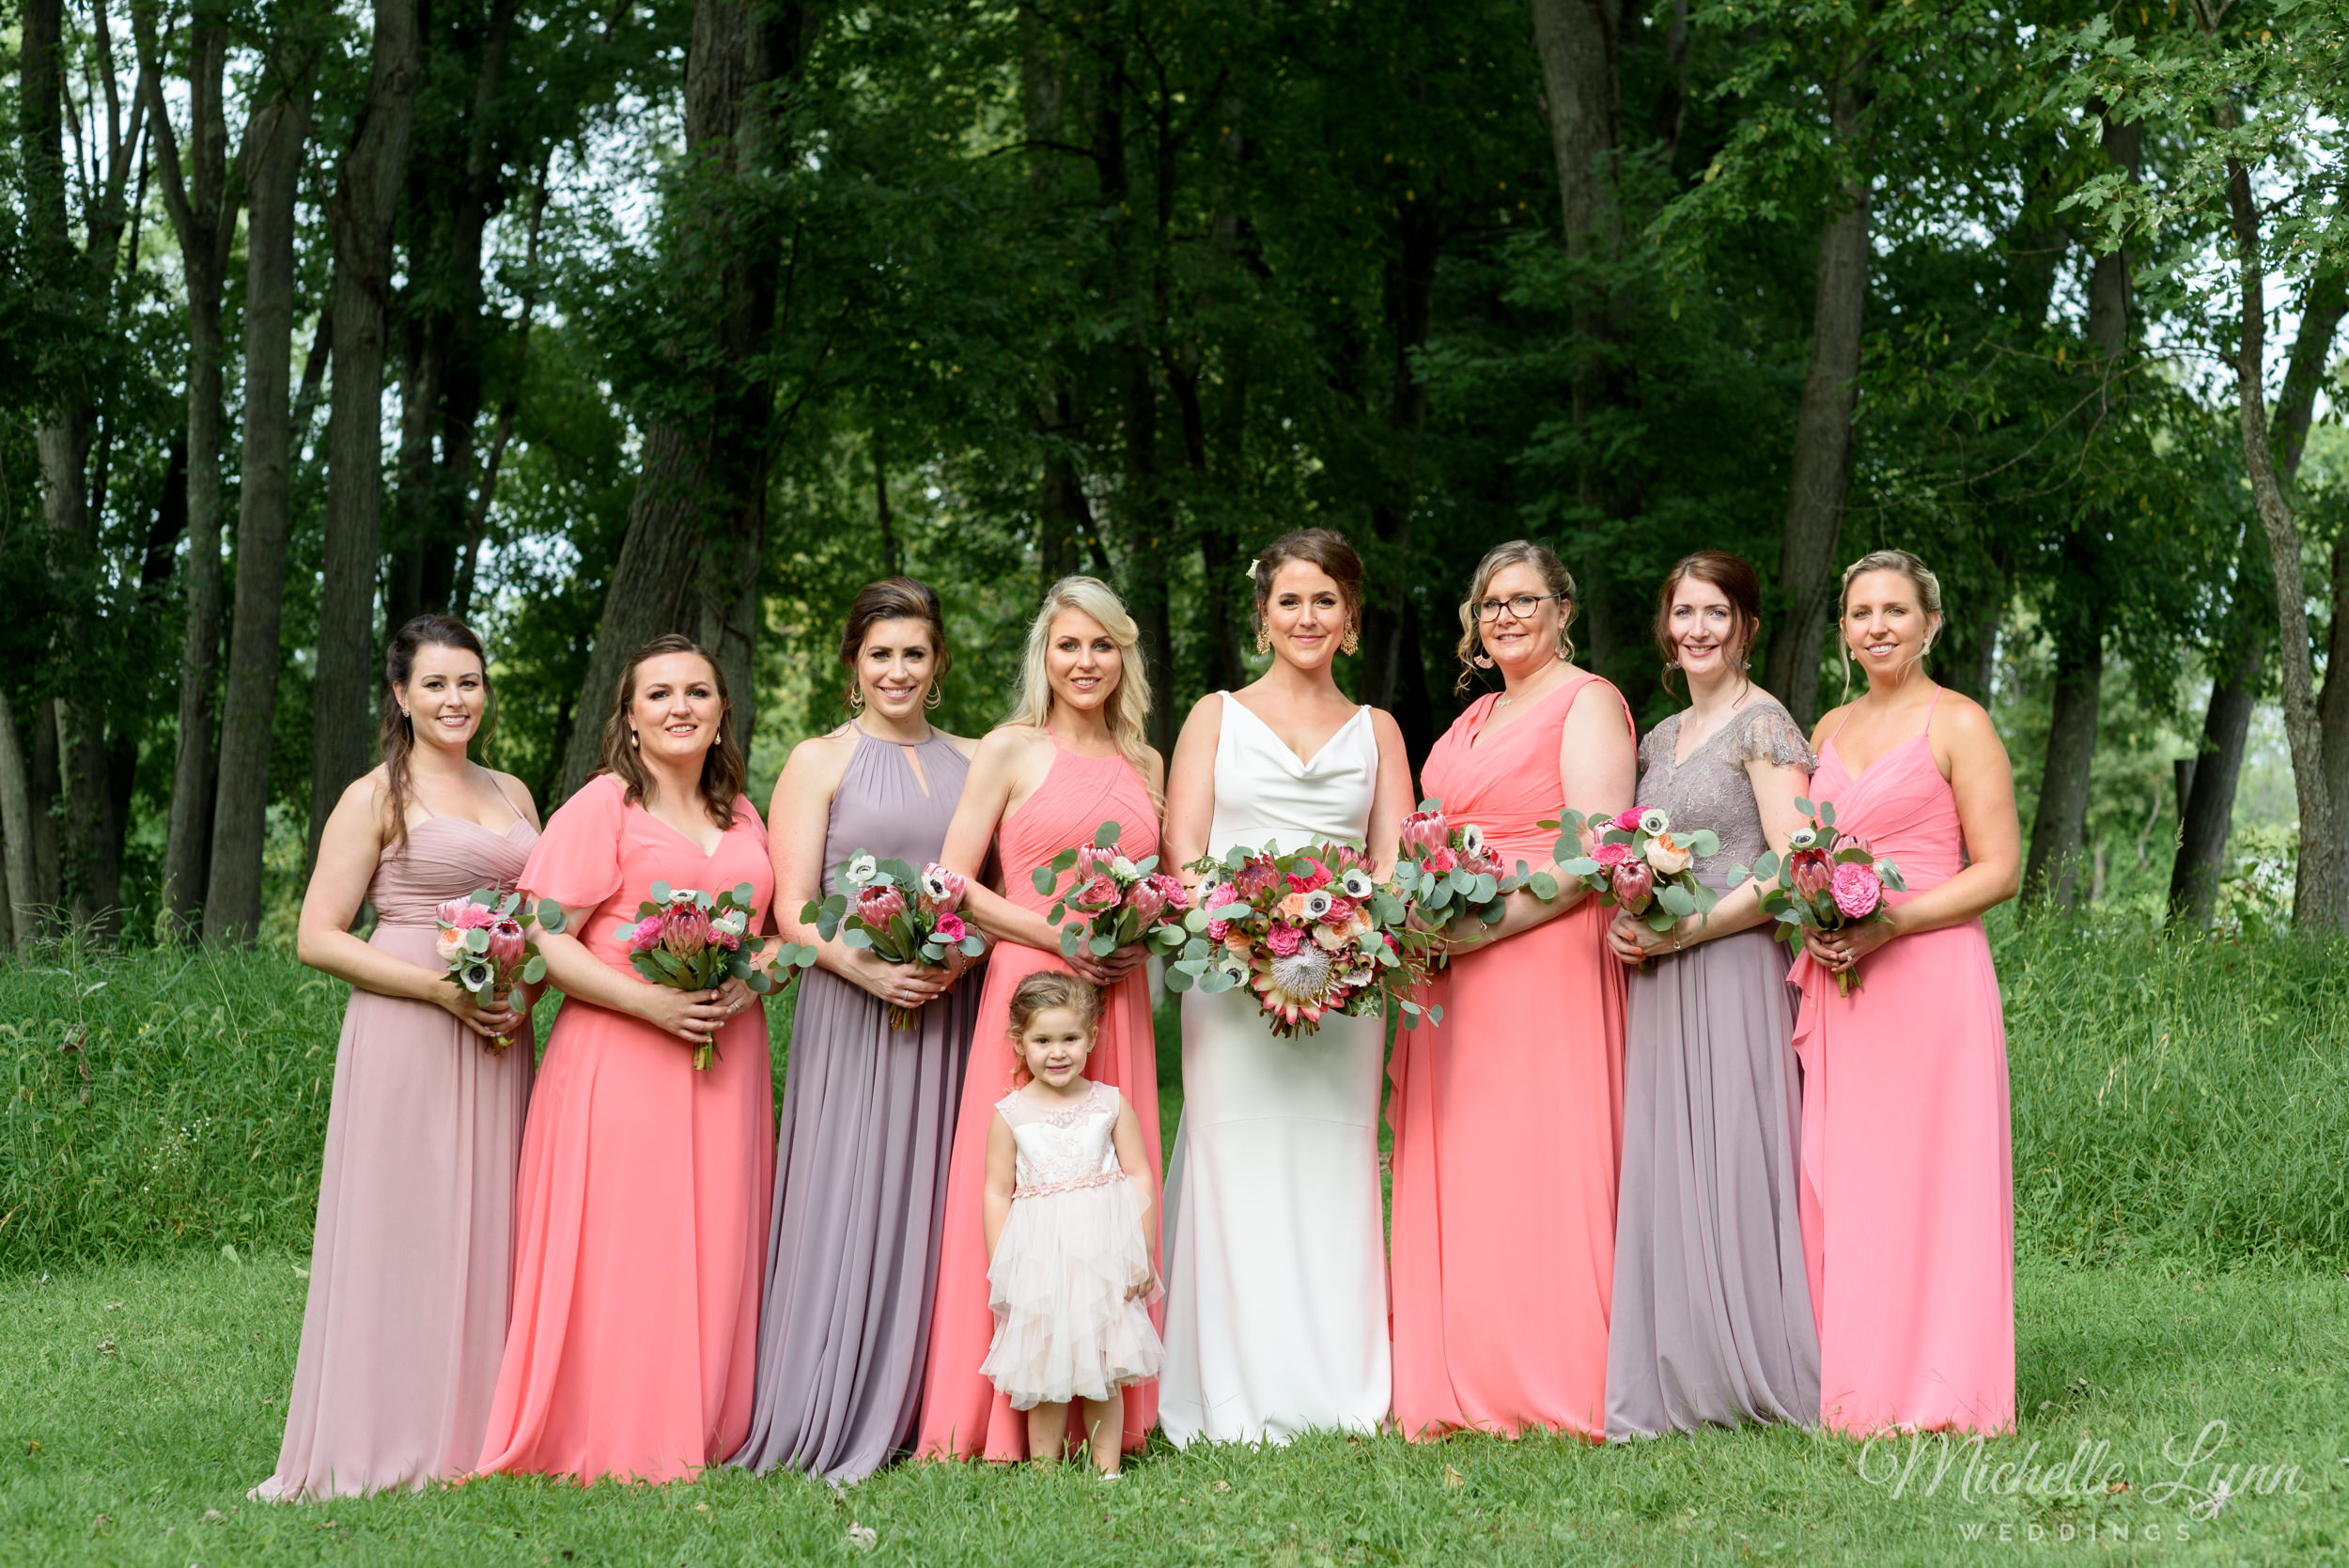 mlw-unionville-vineyards-nj-wedding-photography-50.jpg